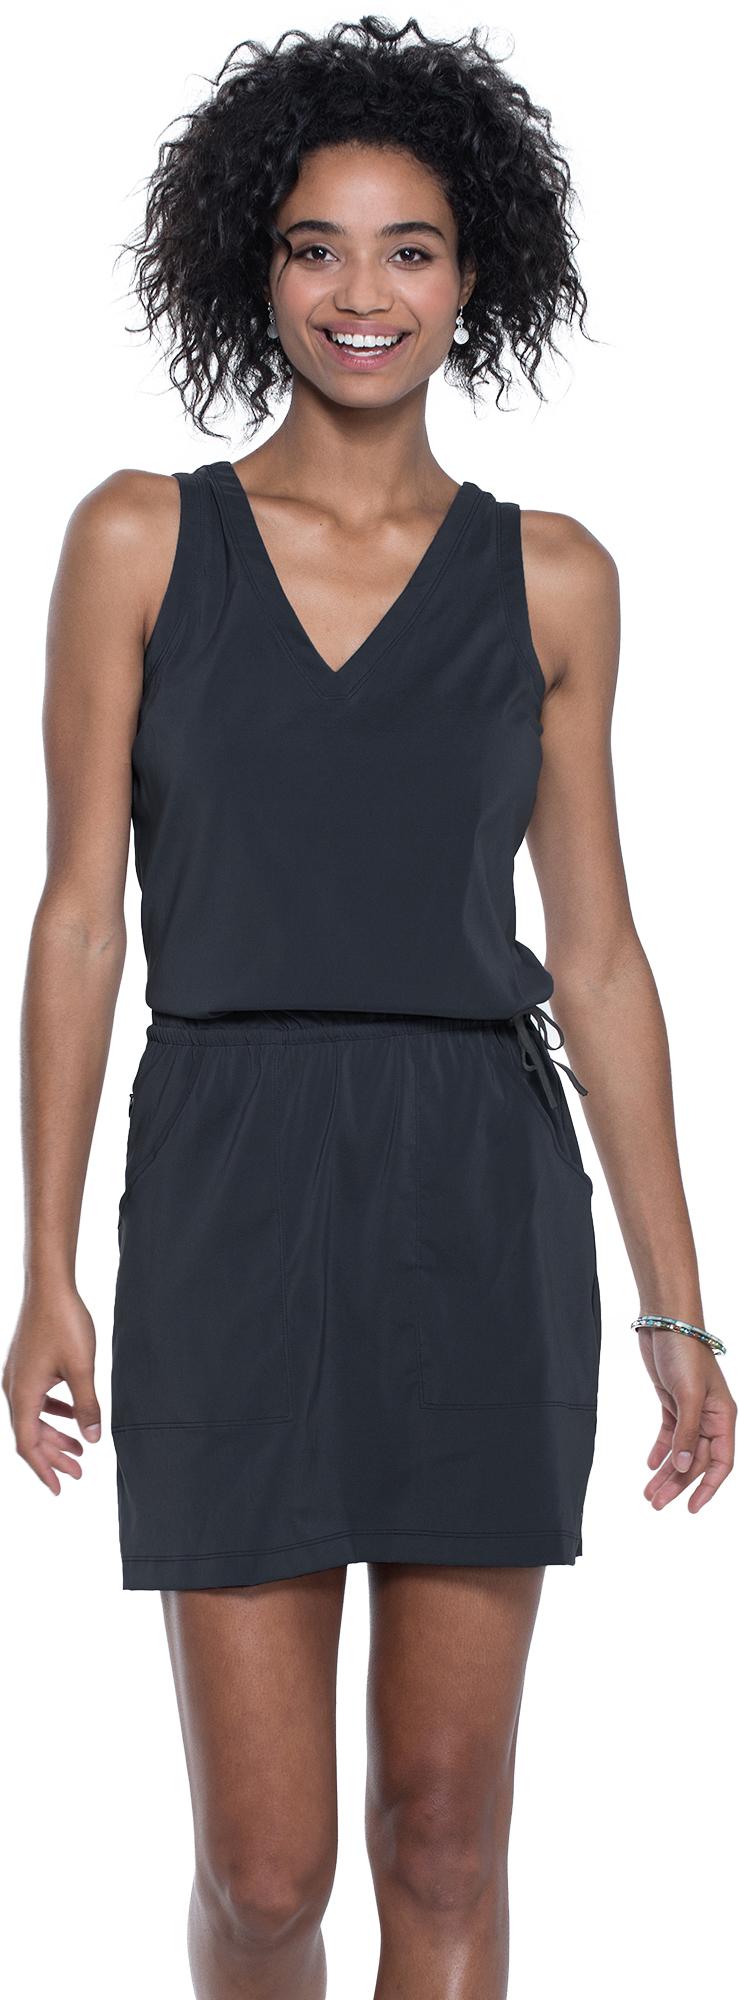 Women\'s Clothing for travel